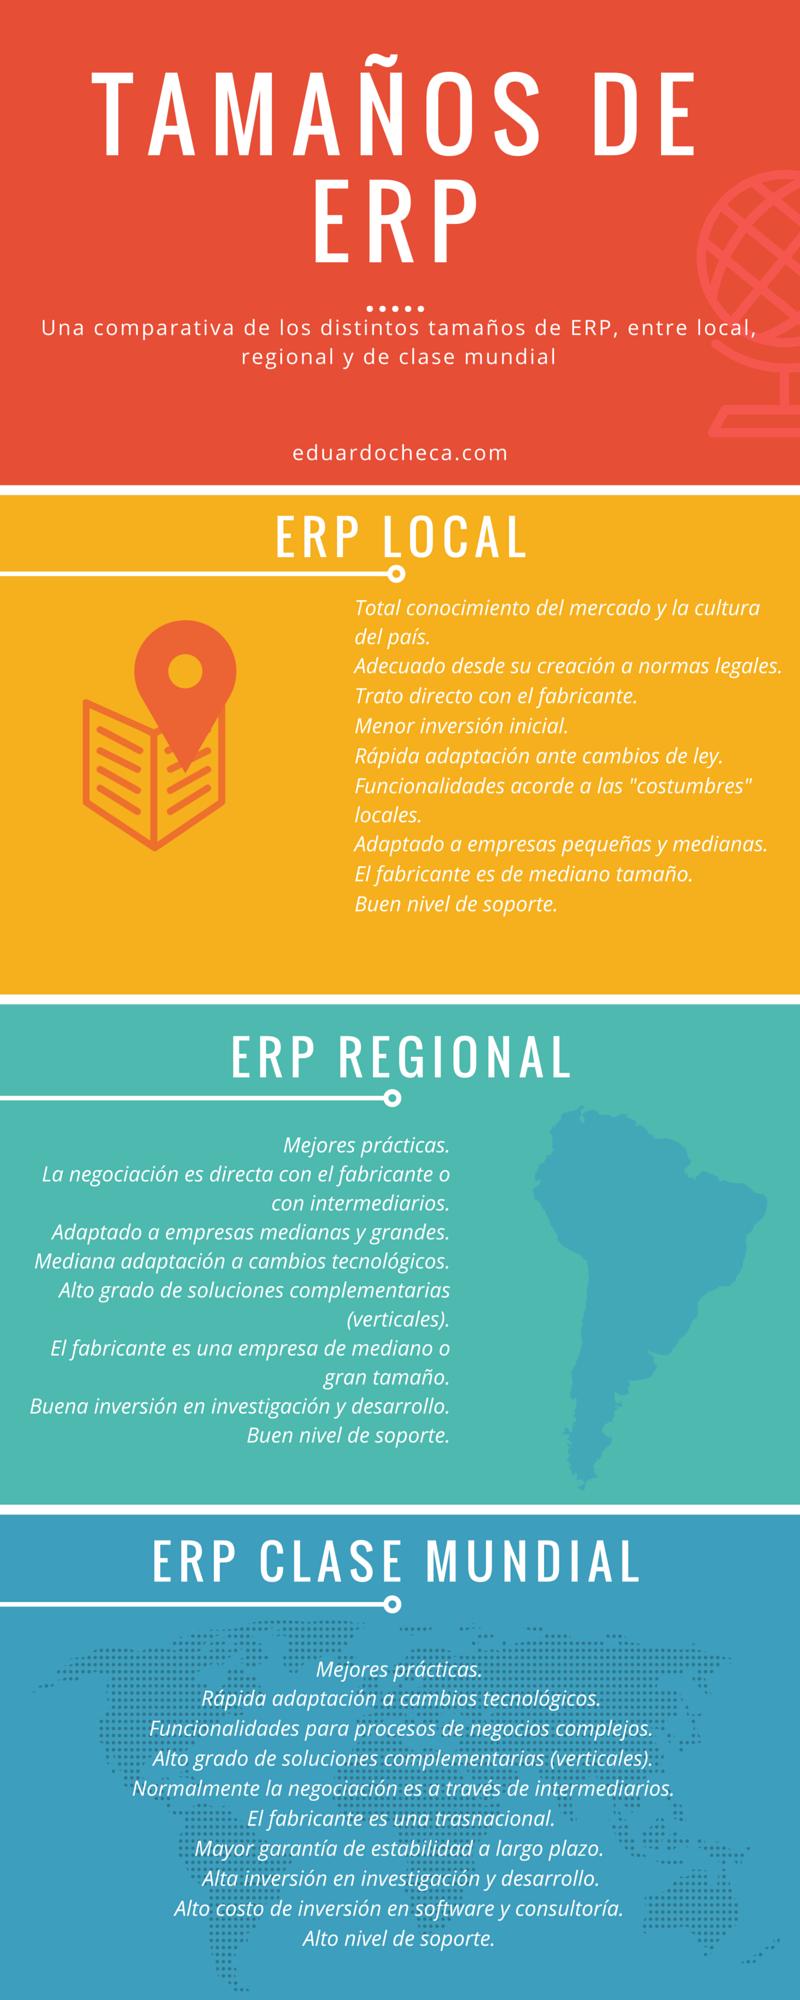 Comparativa entre tamaños de ERP « Eduardo Checa